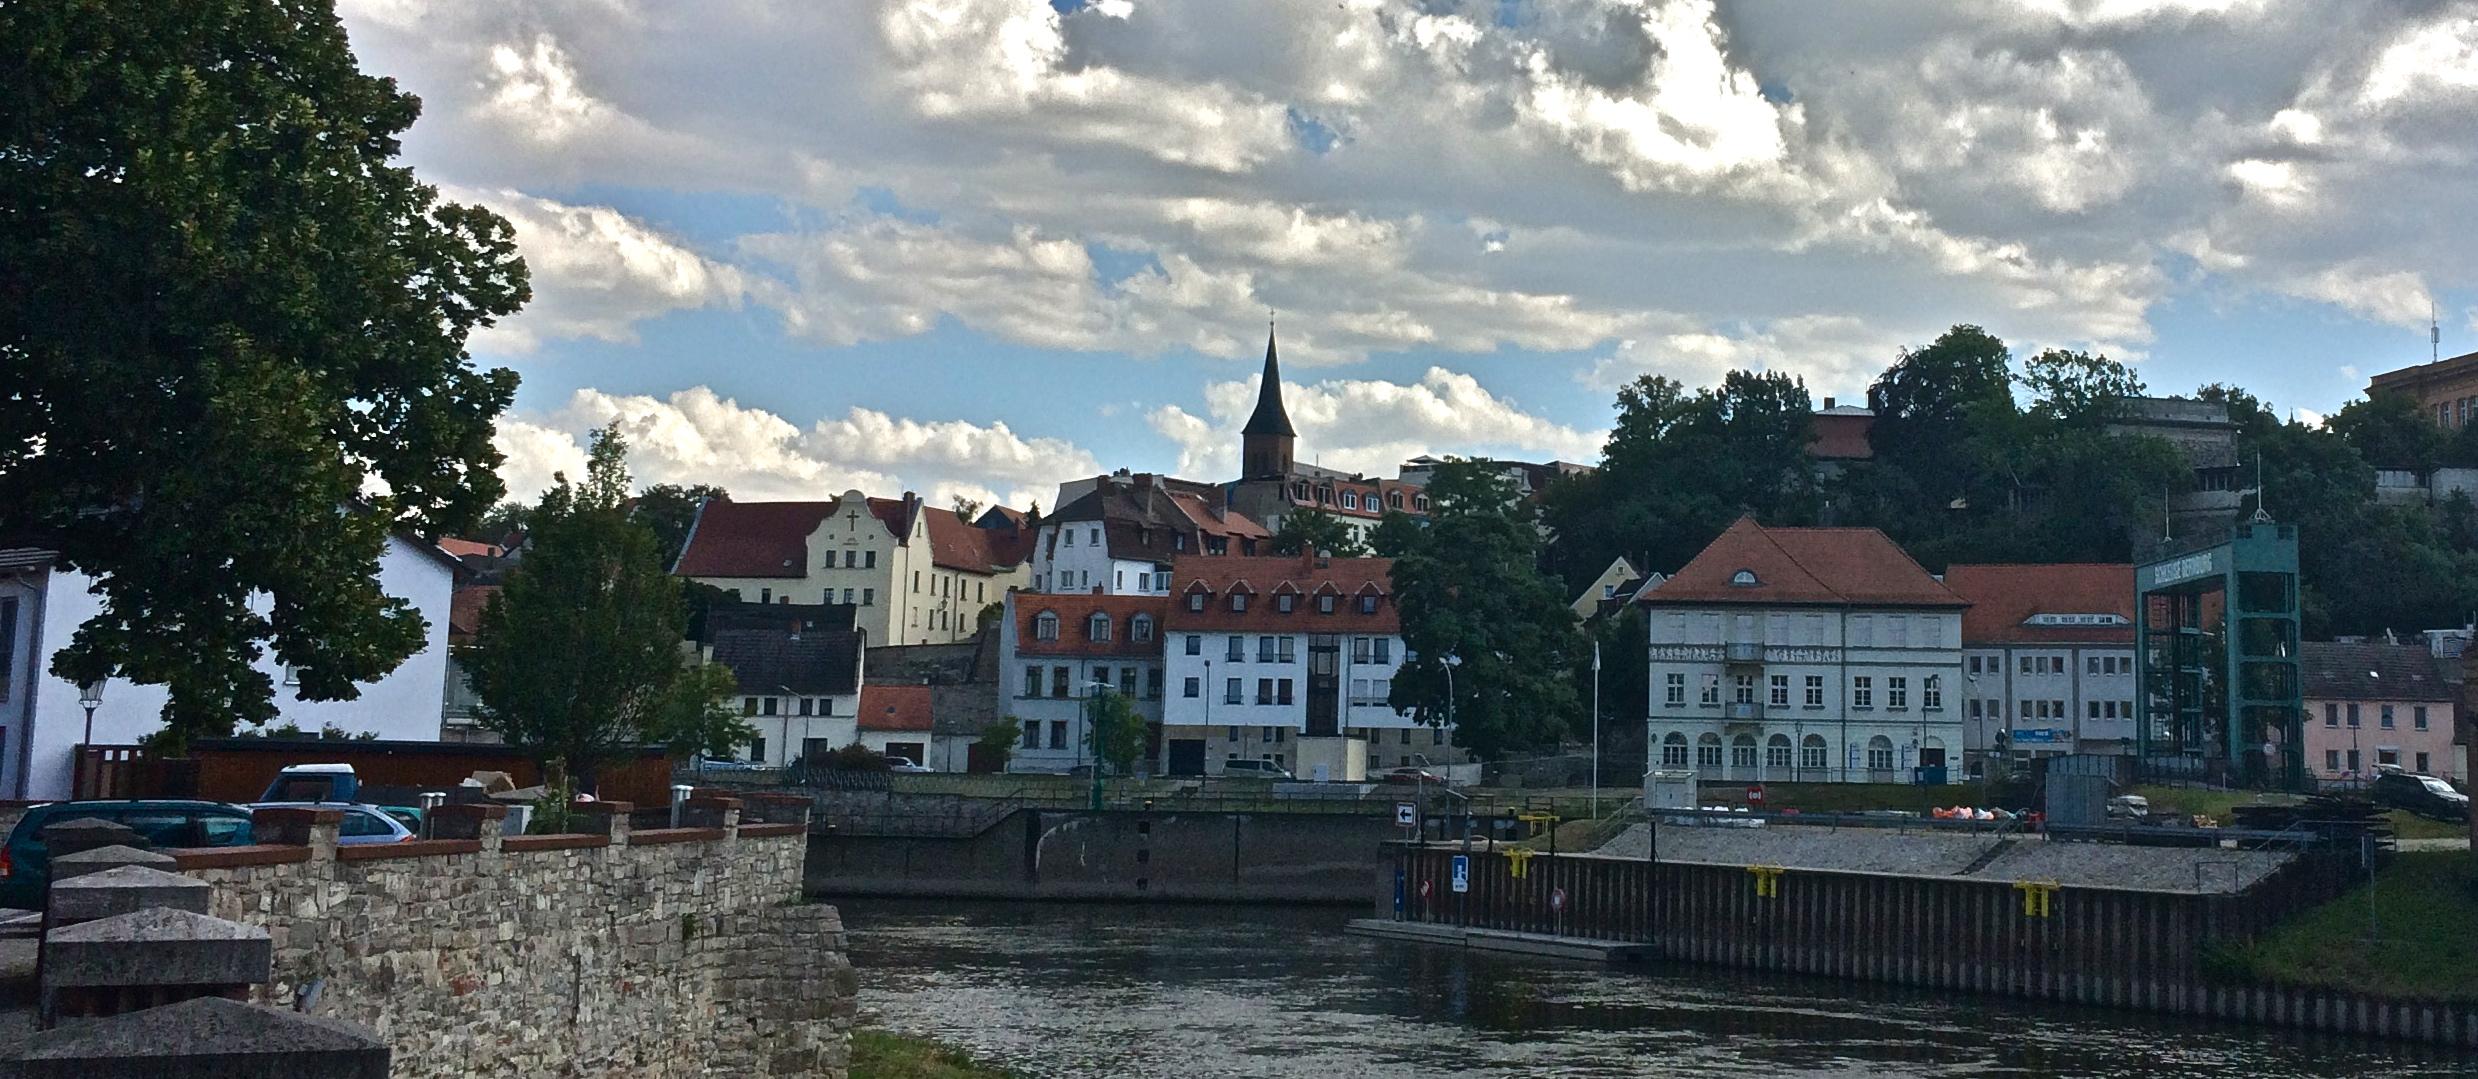 Bergstadt mit Bonifatiuskirche